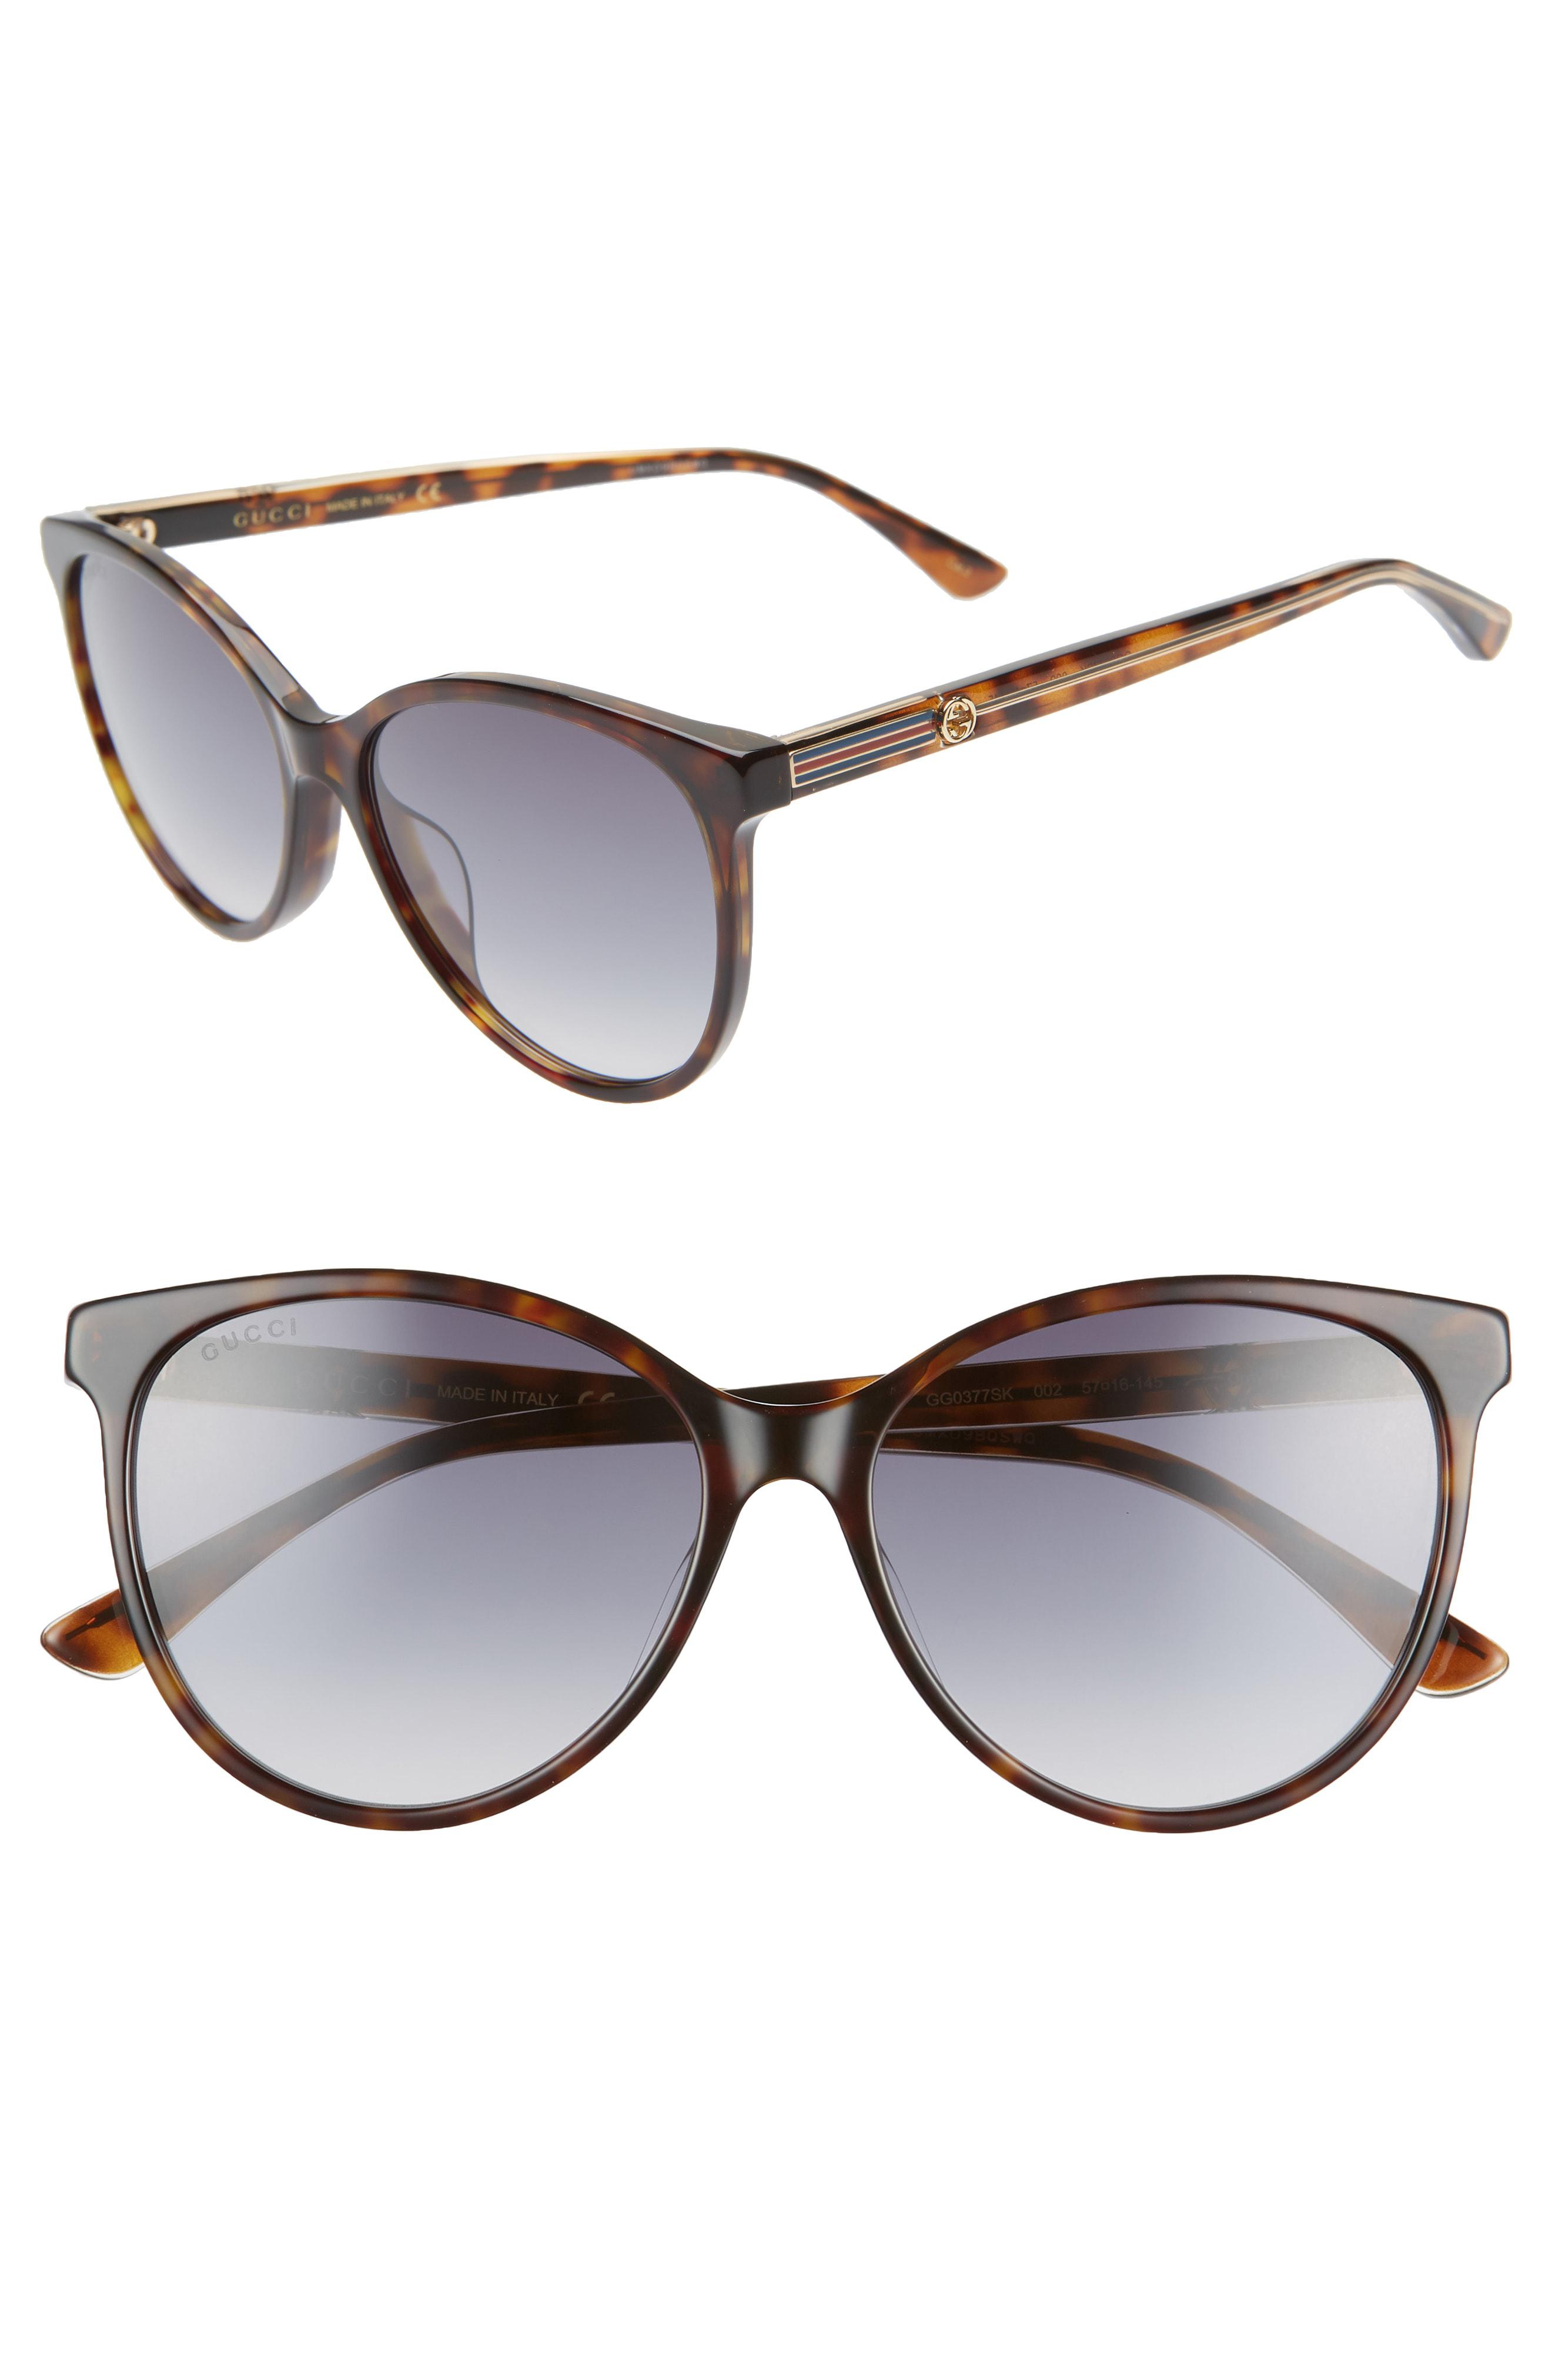 058deb8d3f91 Gucci 57Mm Cat Eye Sunglasses - Dk Havana/Cry/Grey Gradient | ModeSens